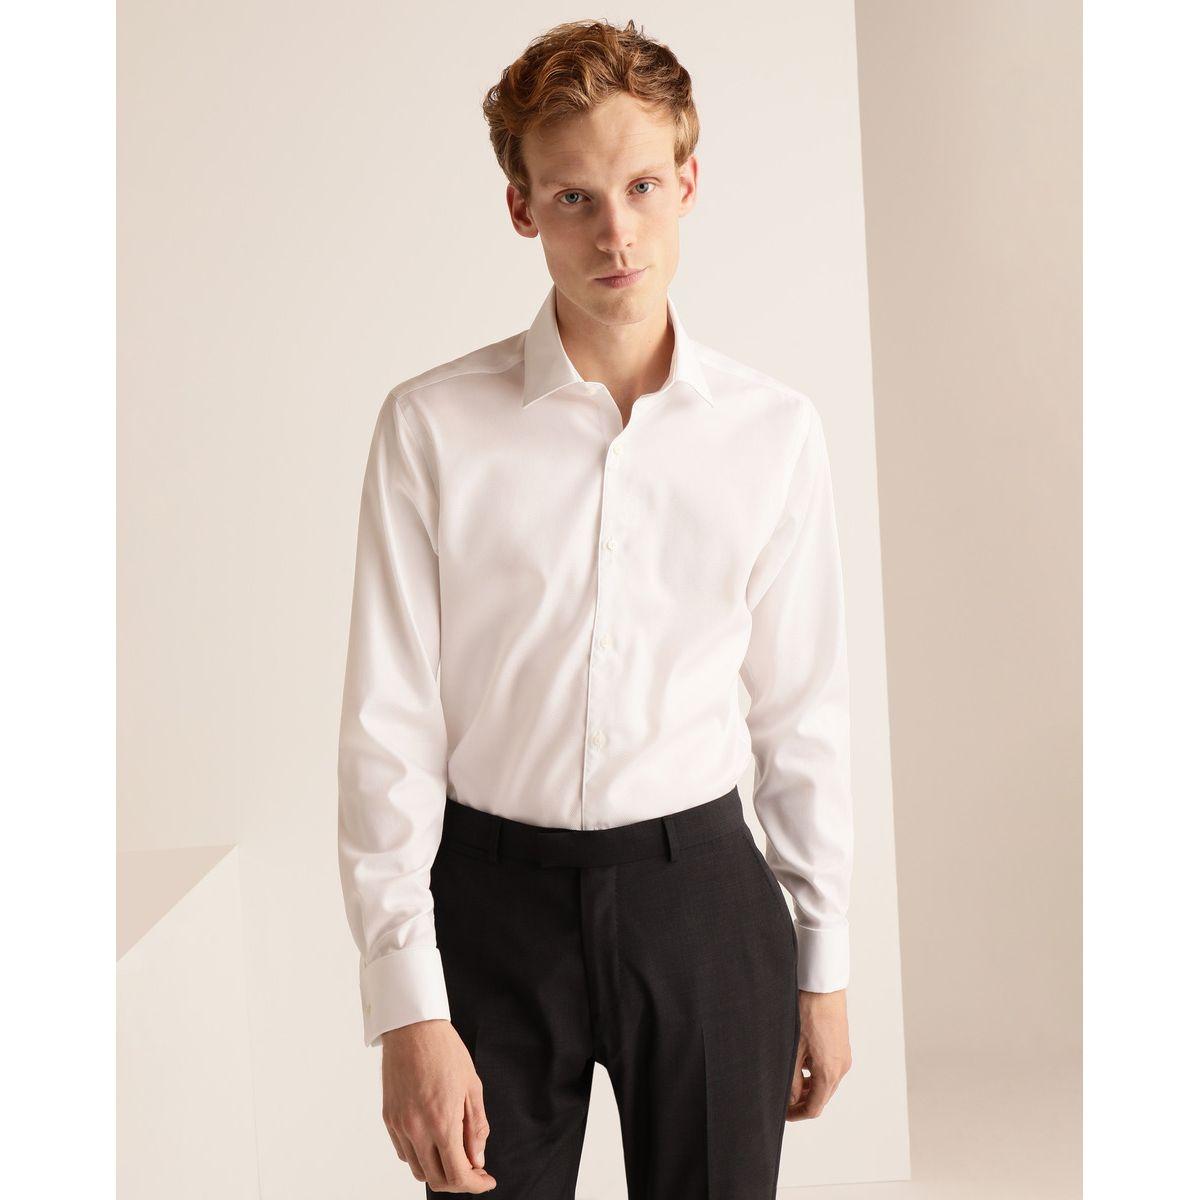 Chemise slim habillée sans repassage unie